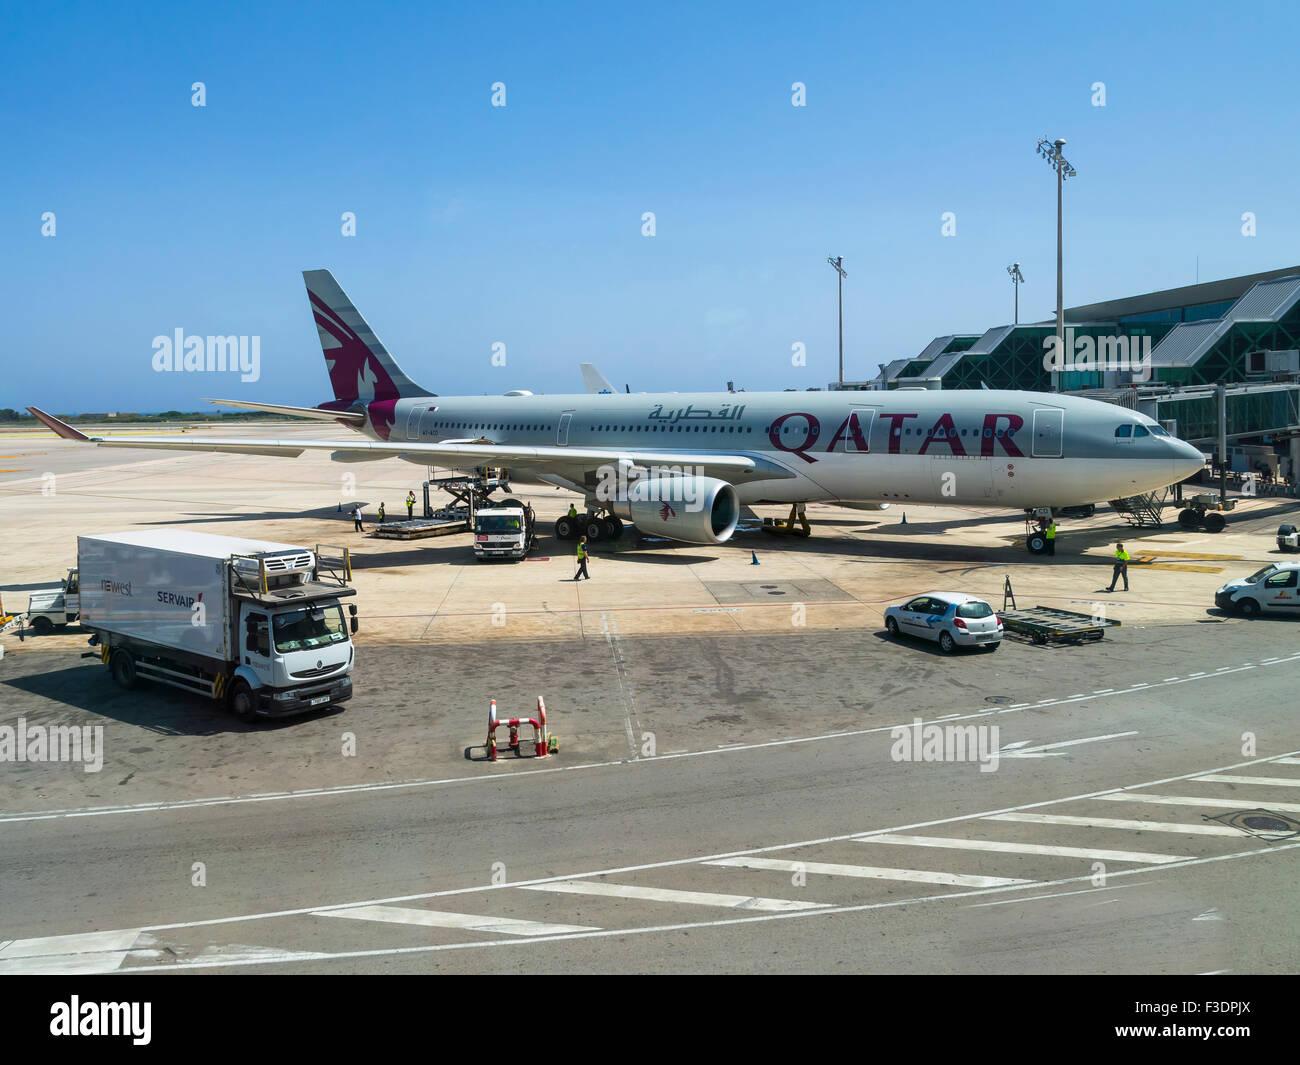 Qatar aircraft at the terminal, Barcelona airport, Spain - Stock Image